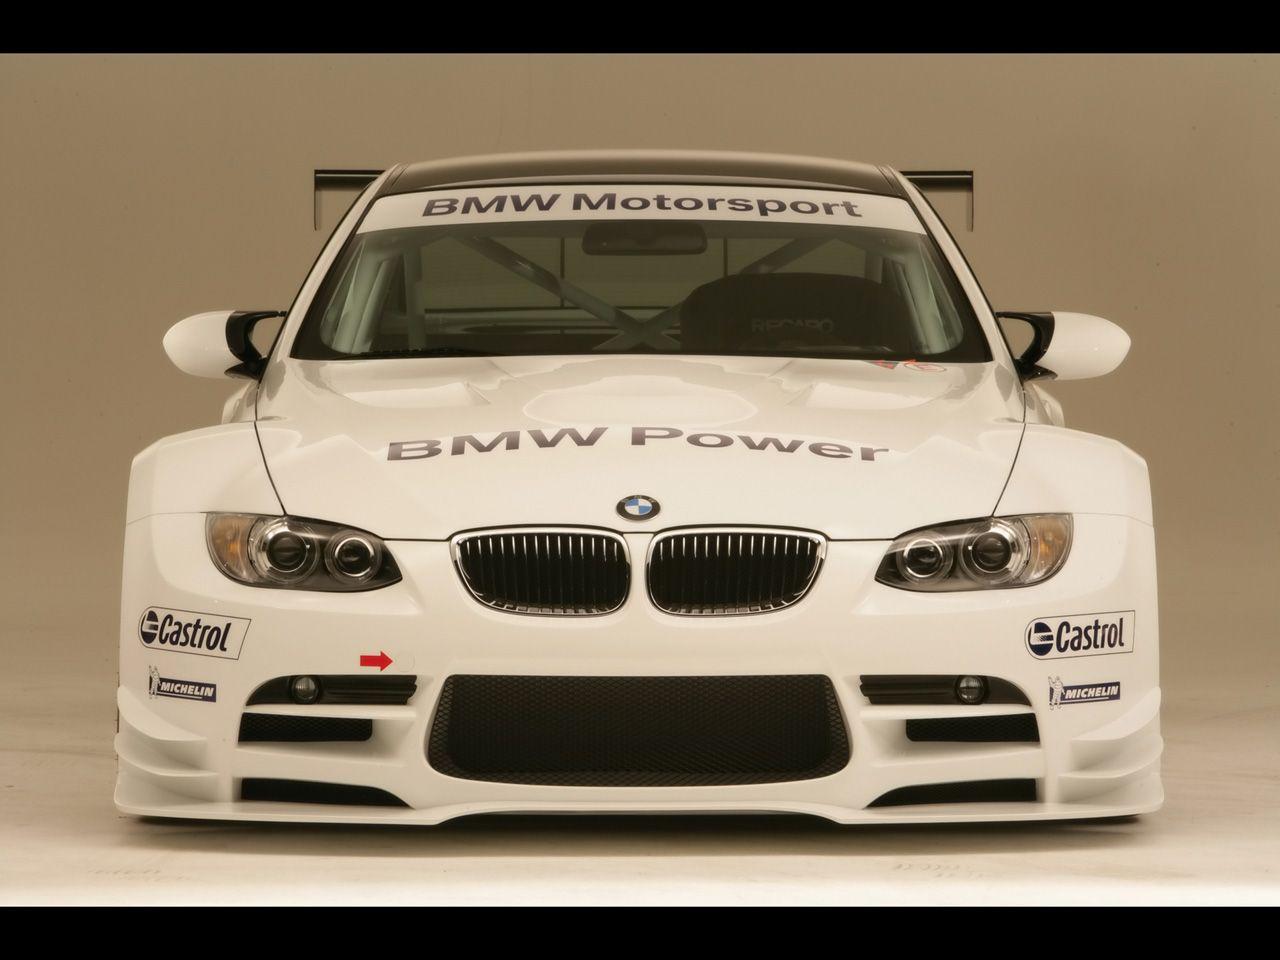 Image for sport cars fans bmw sport car bm0143